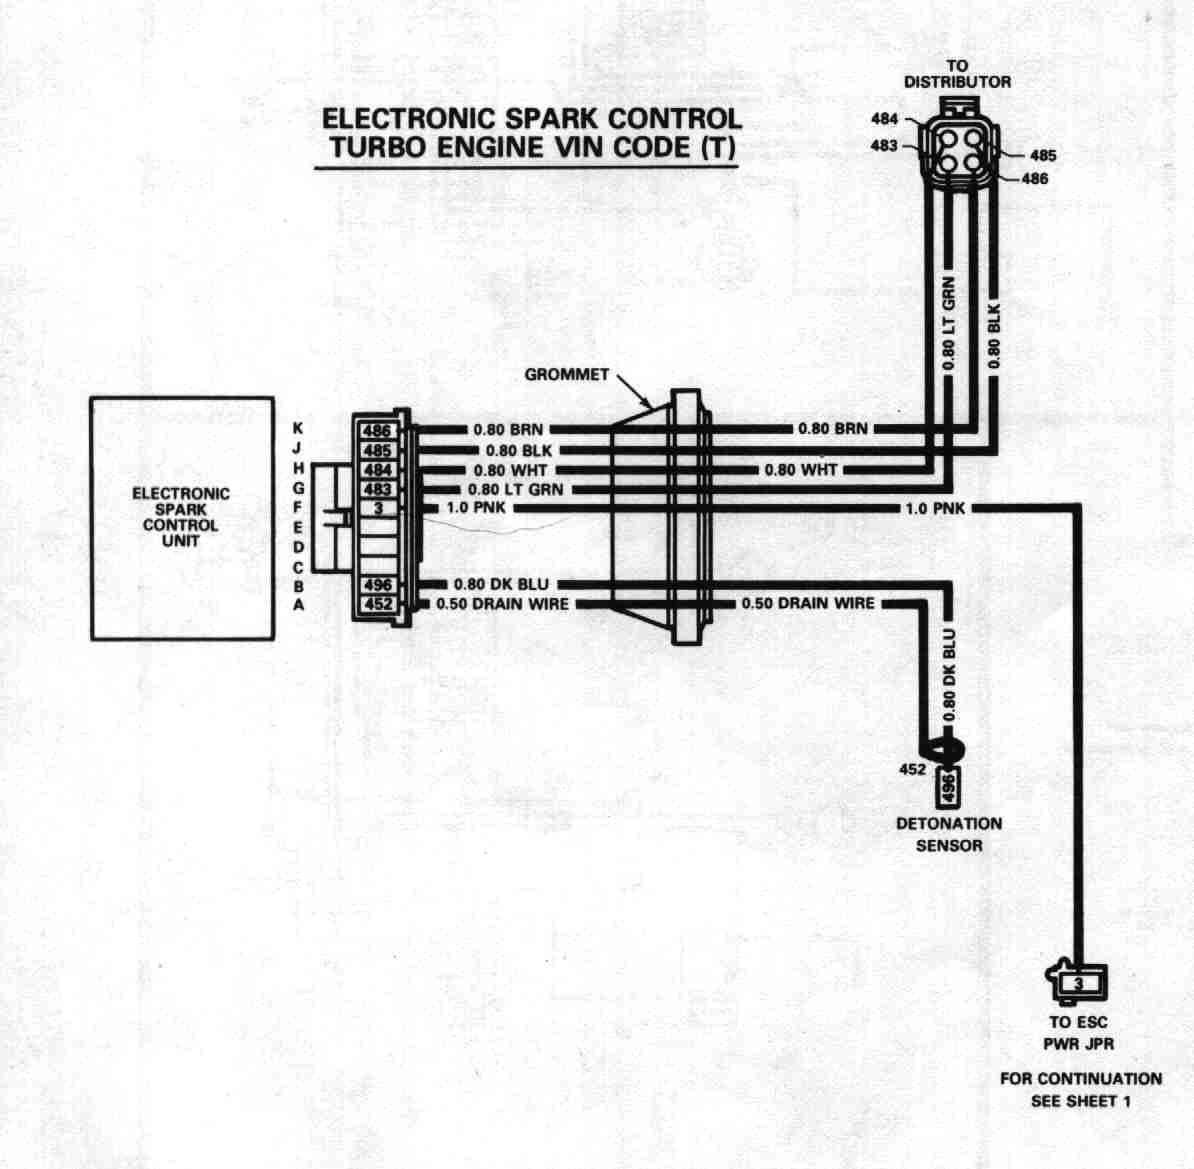 tags: #high vacuum pump#leybold vacuum pump#edwards turbomolecular  pump#pump vacuum fixture#vacuum pump parts#small vacuum pump#adixen vacuum